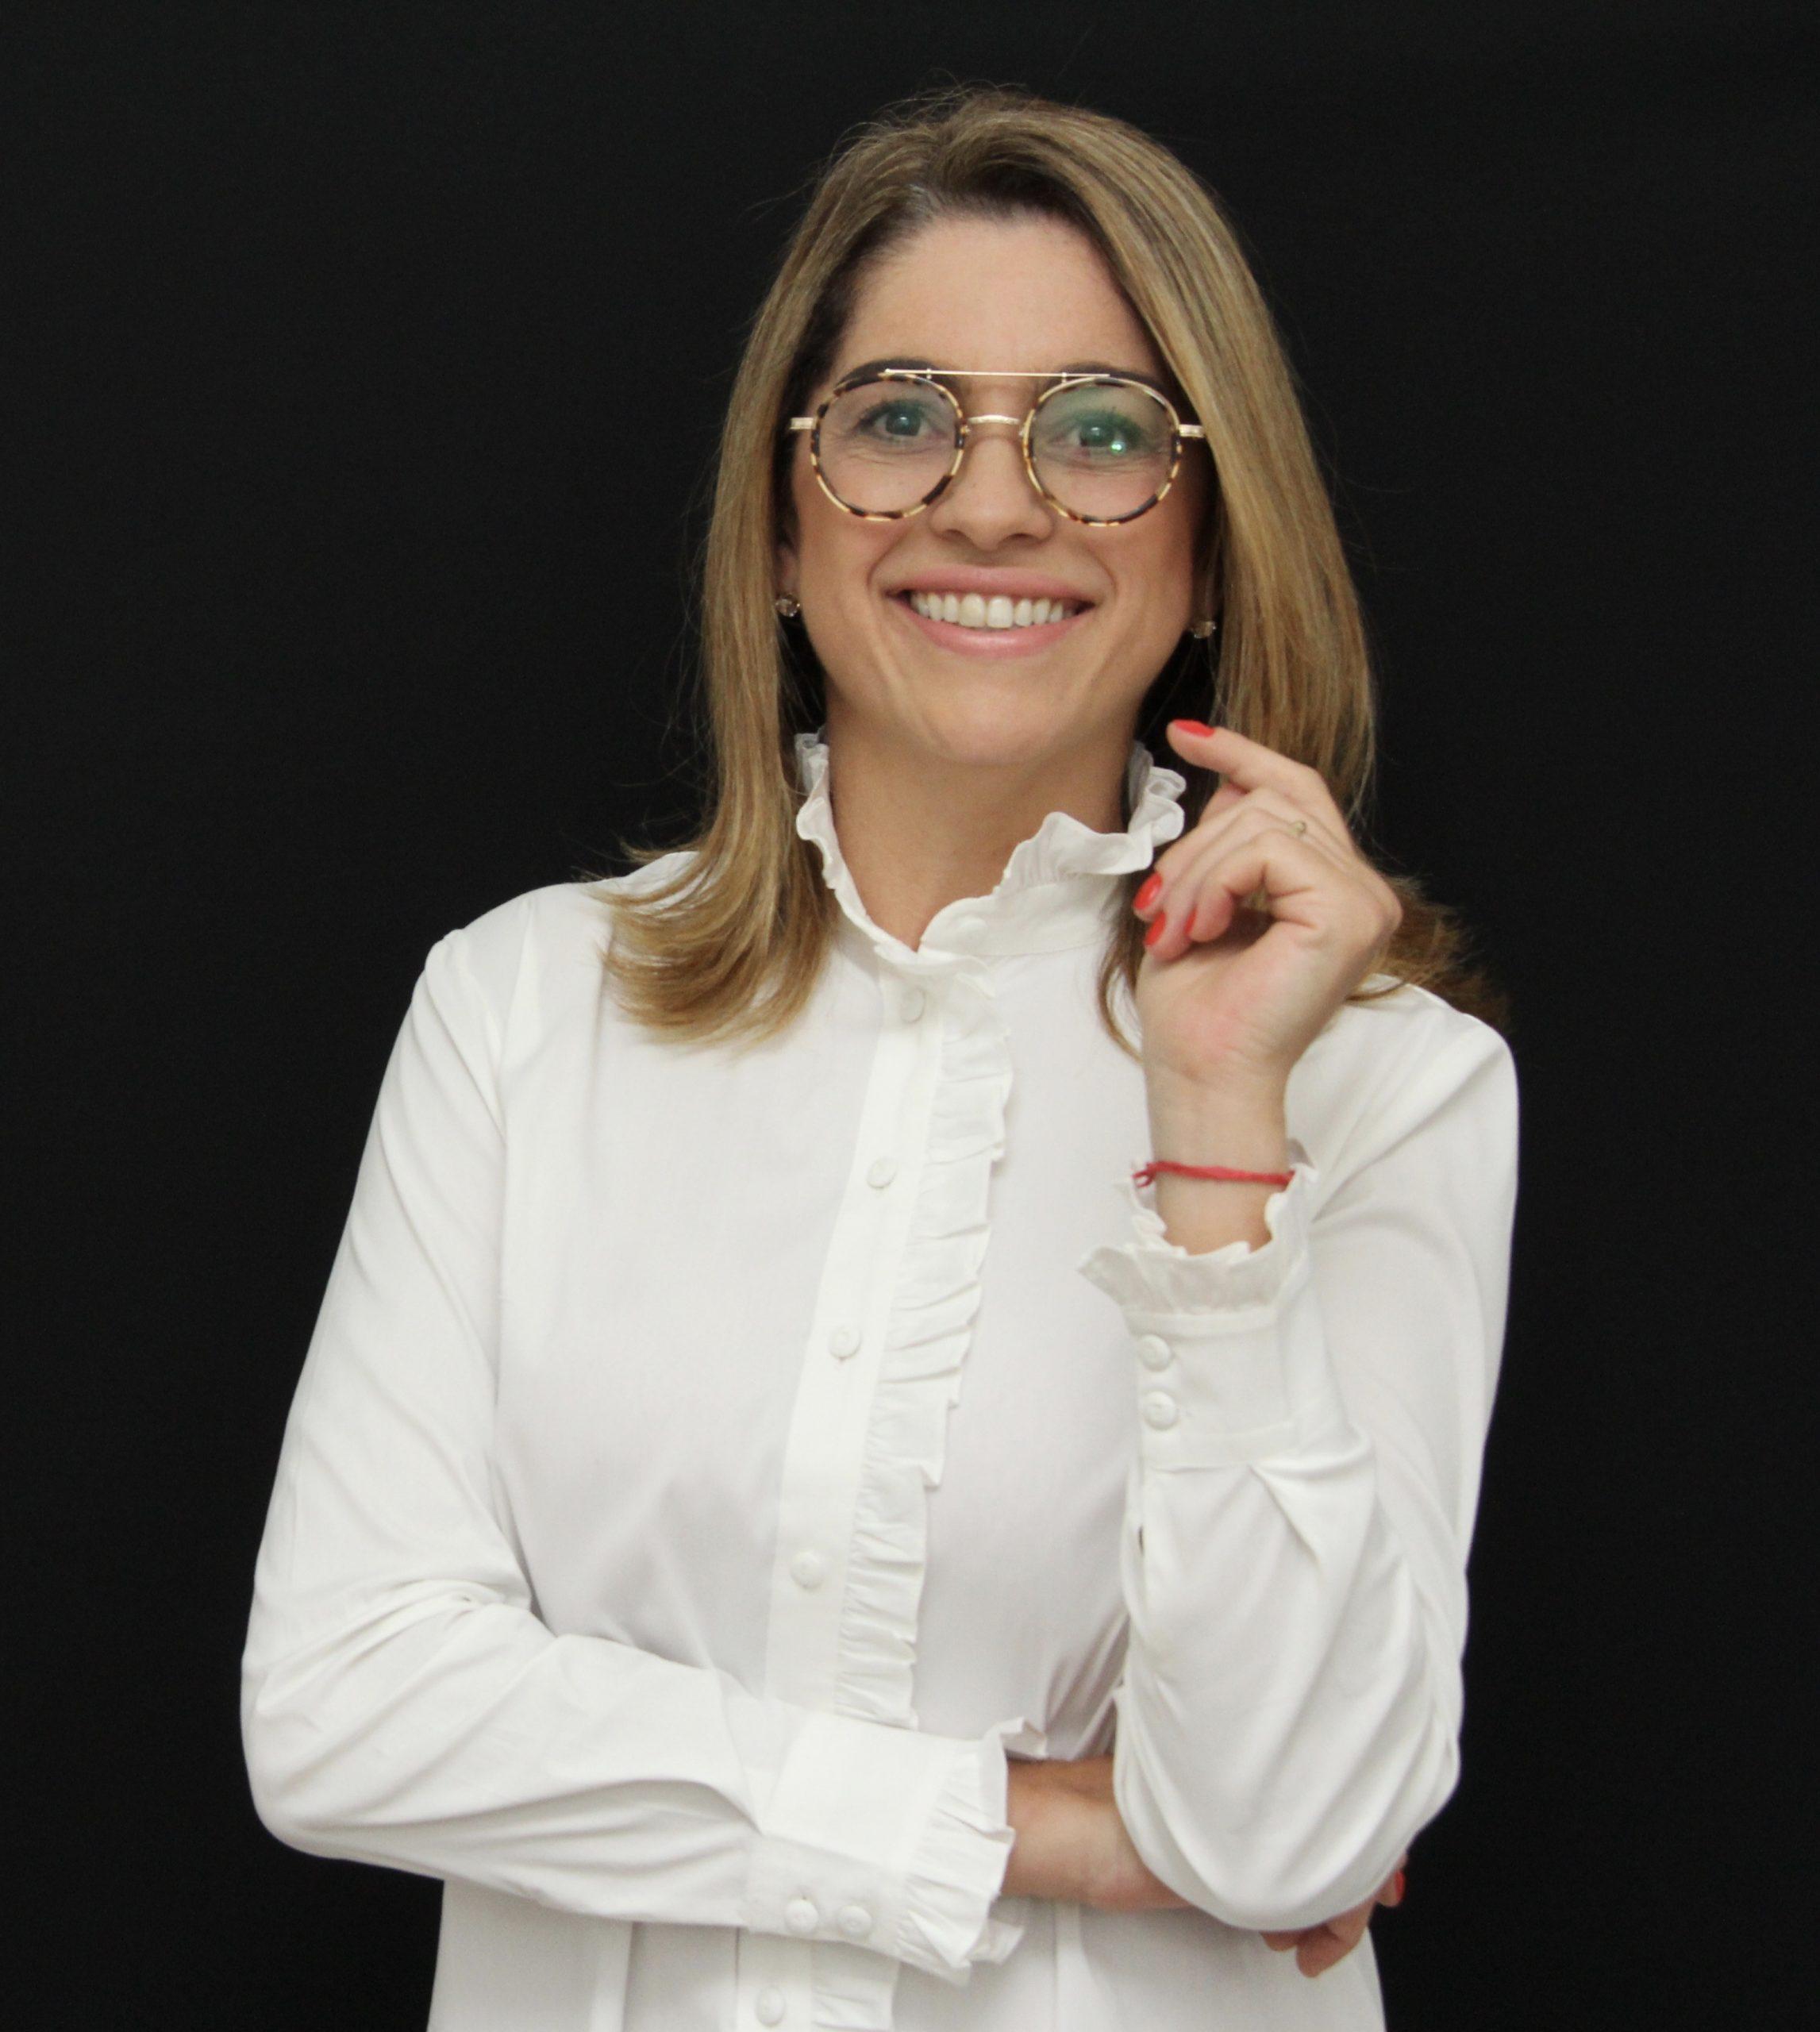 Mércia Gomes